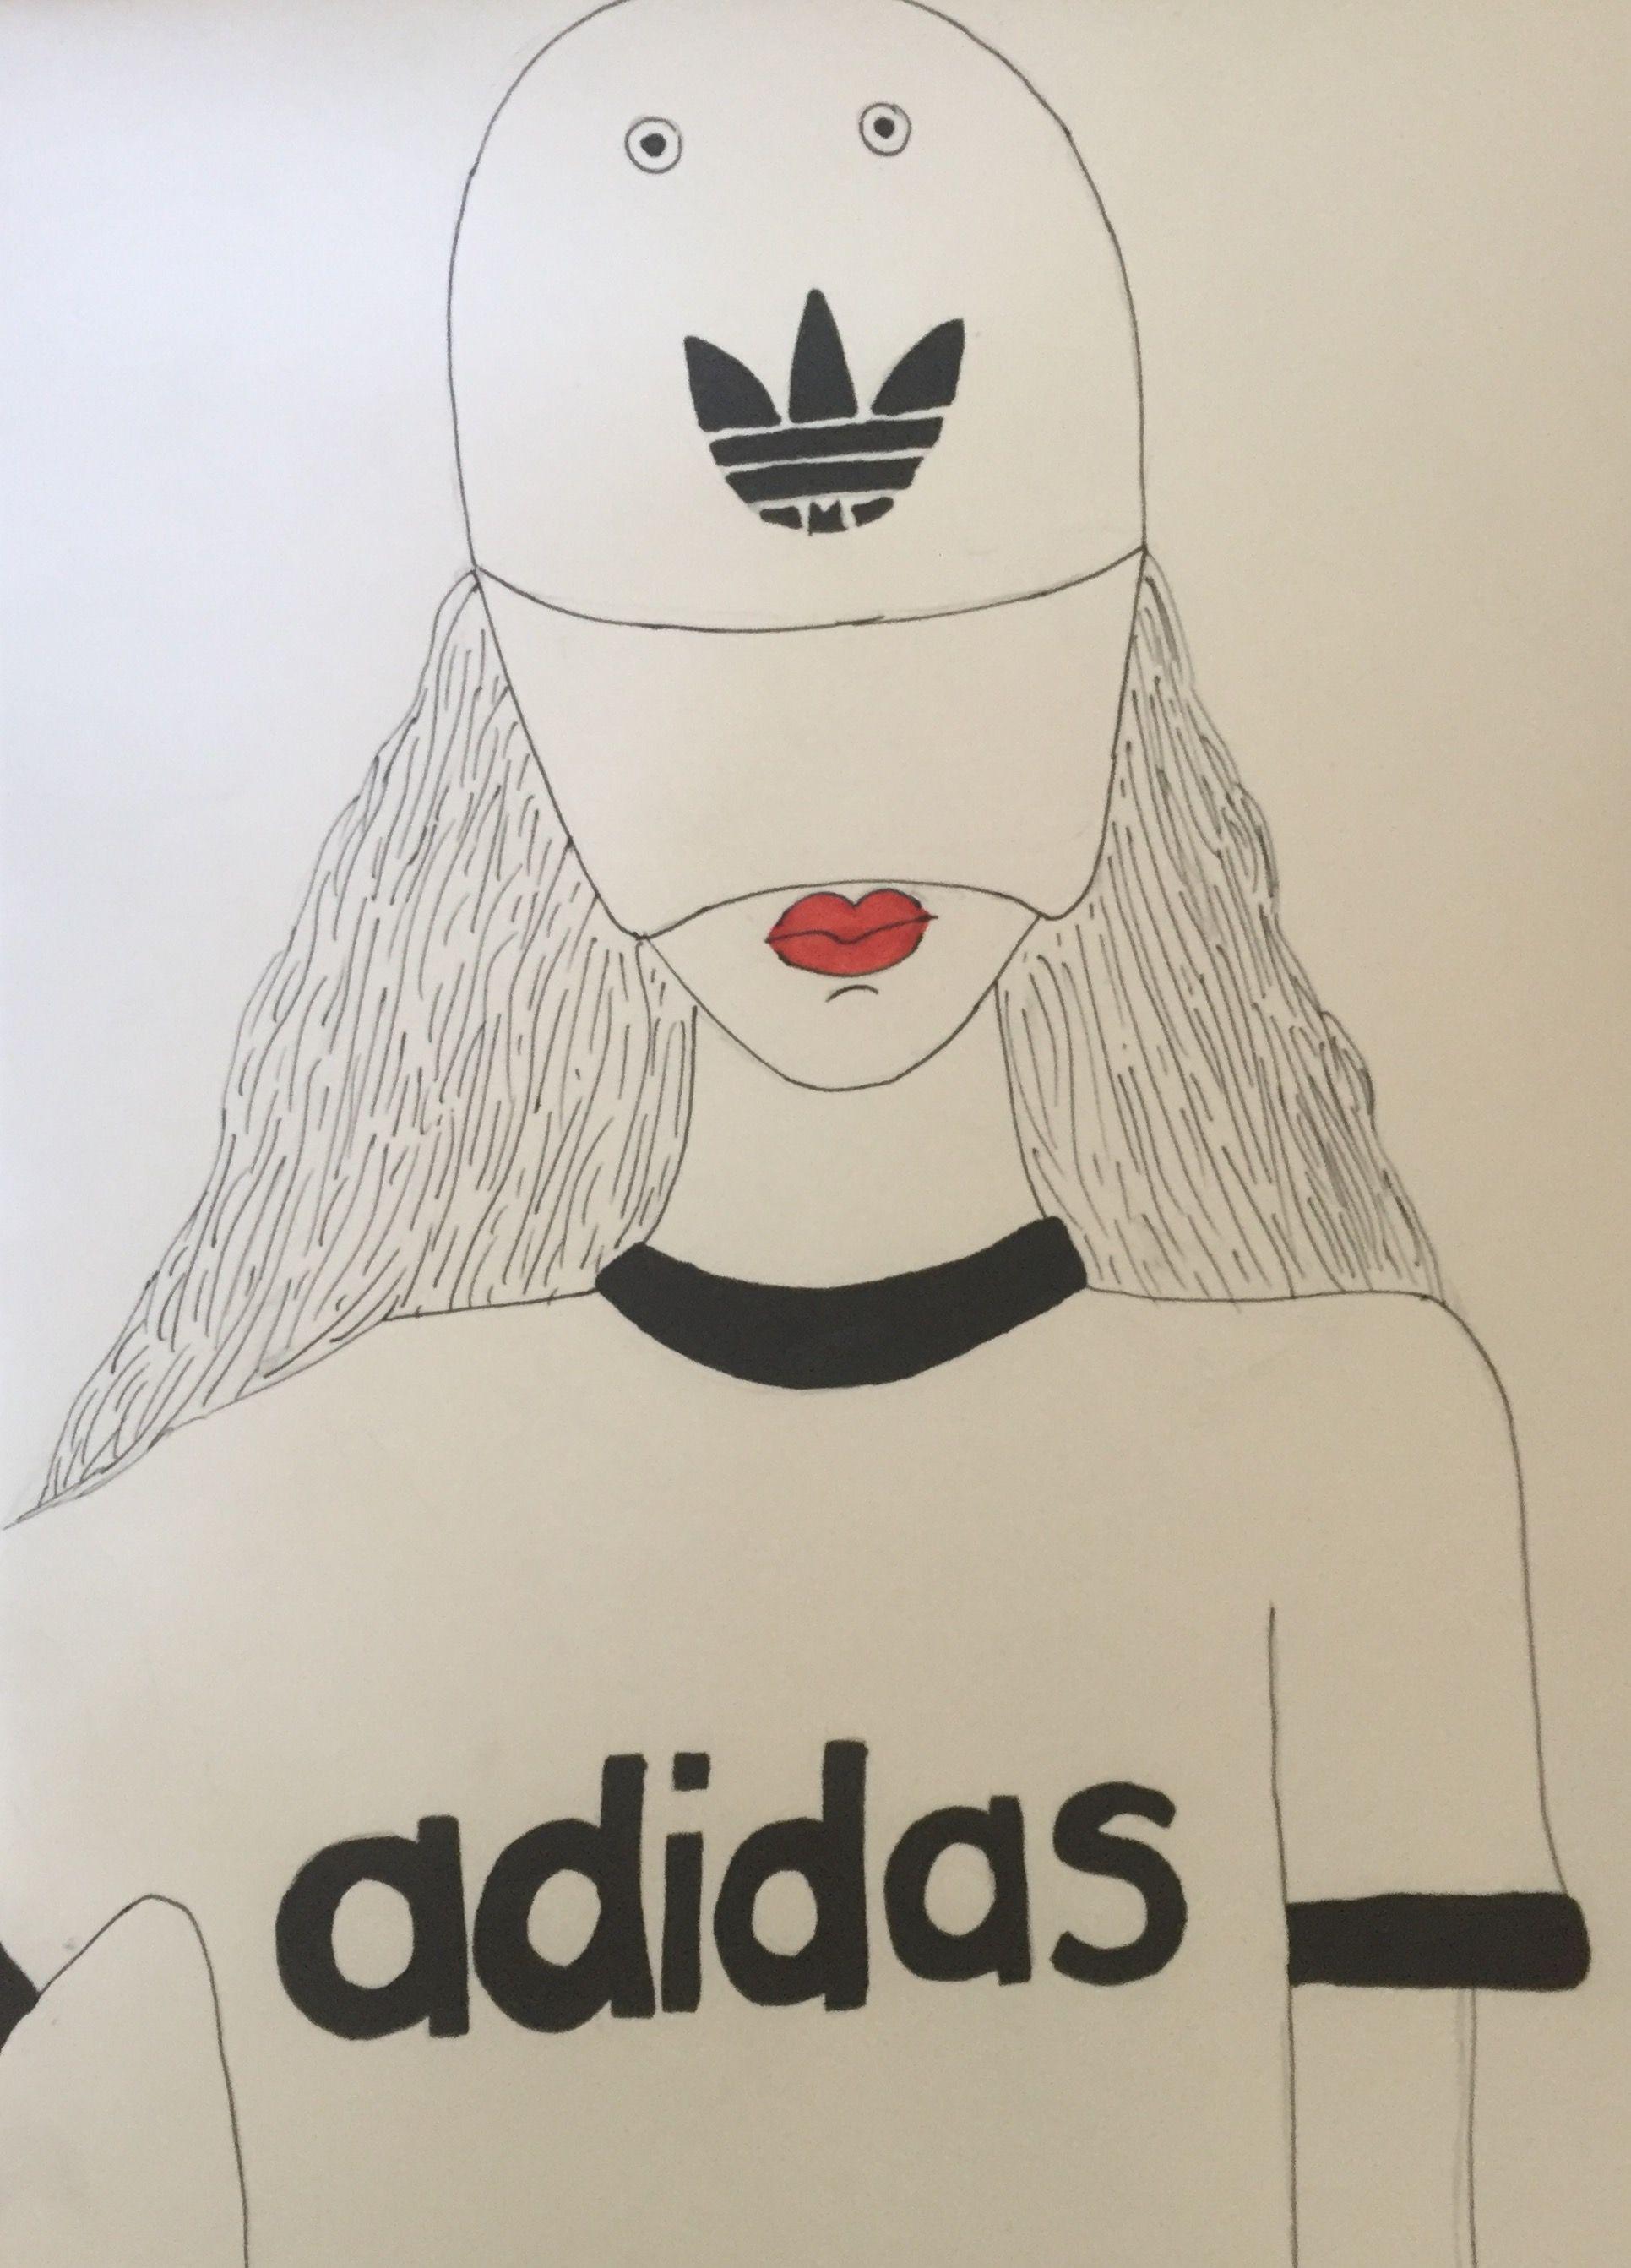 Adidas Meisje Tekenen Vrij Makkelijk Tekenen Meisjes Tekenen